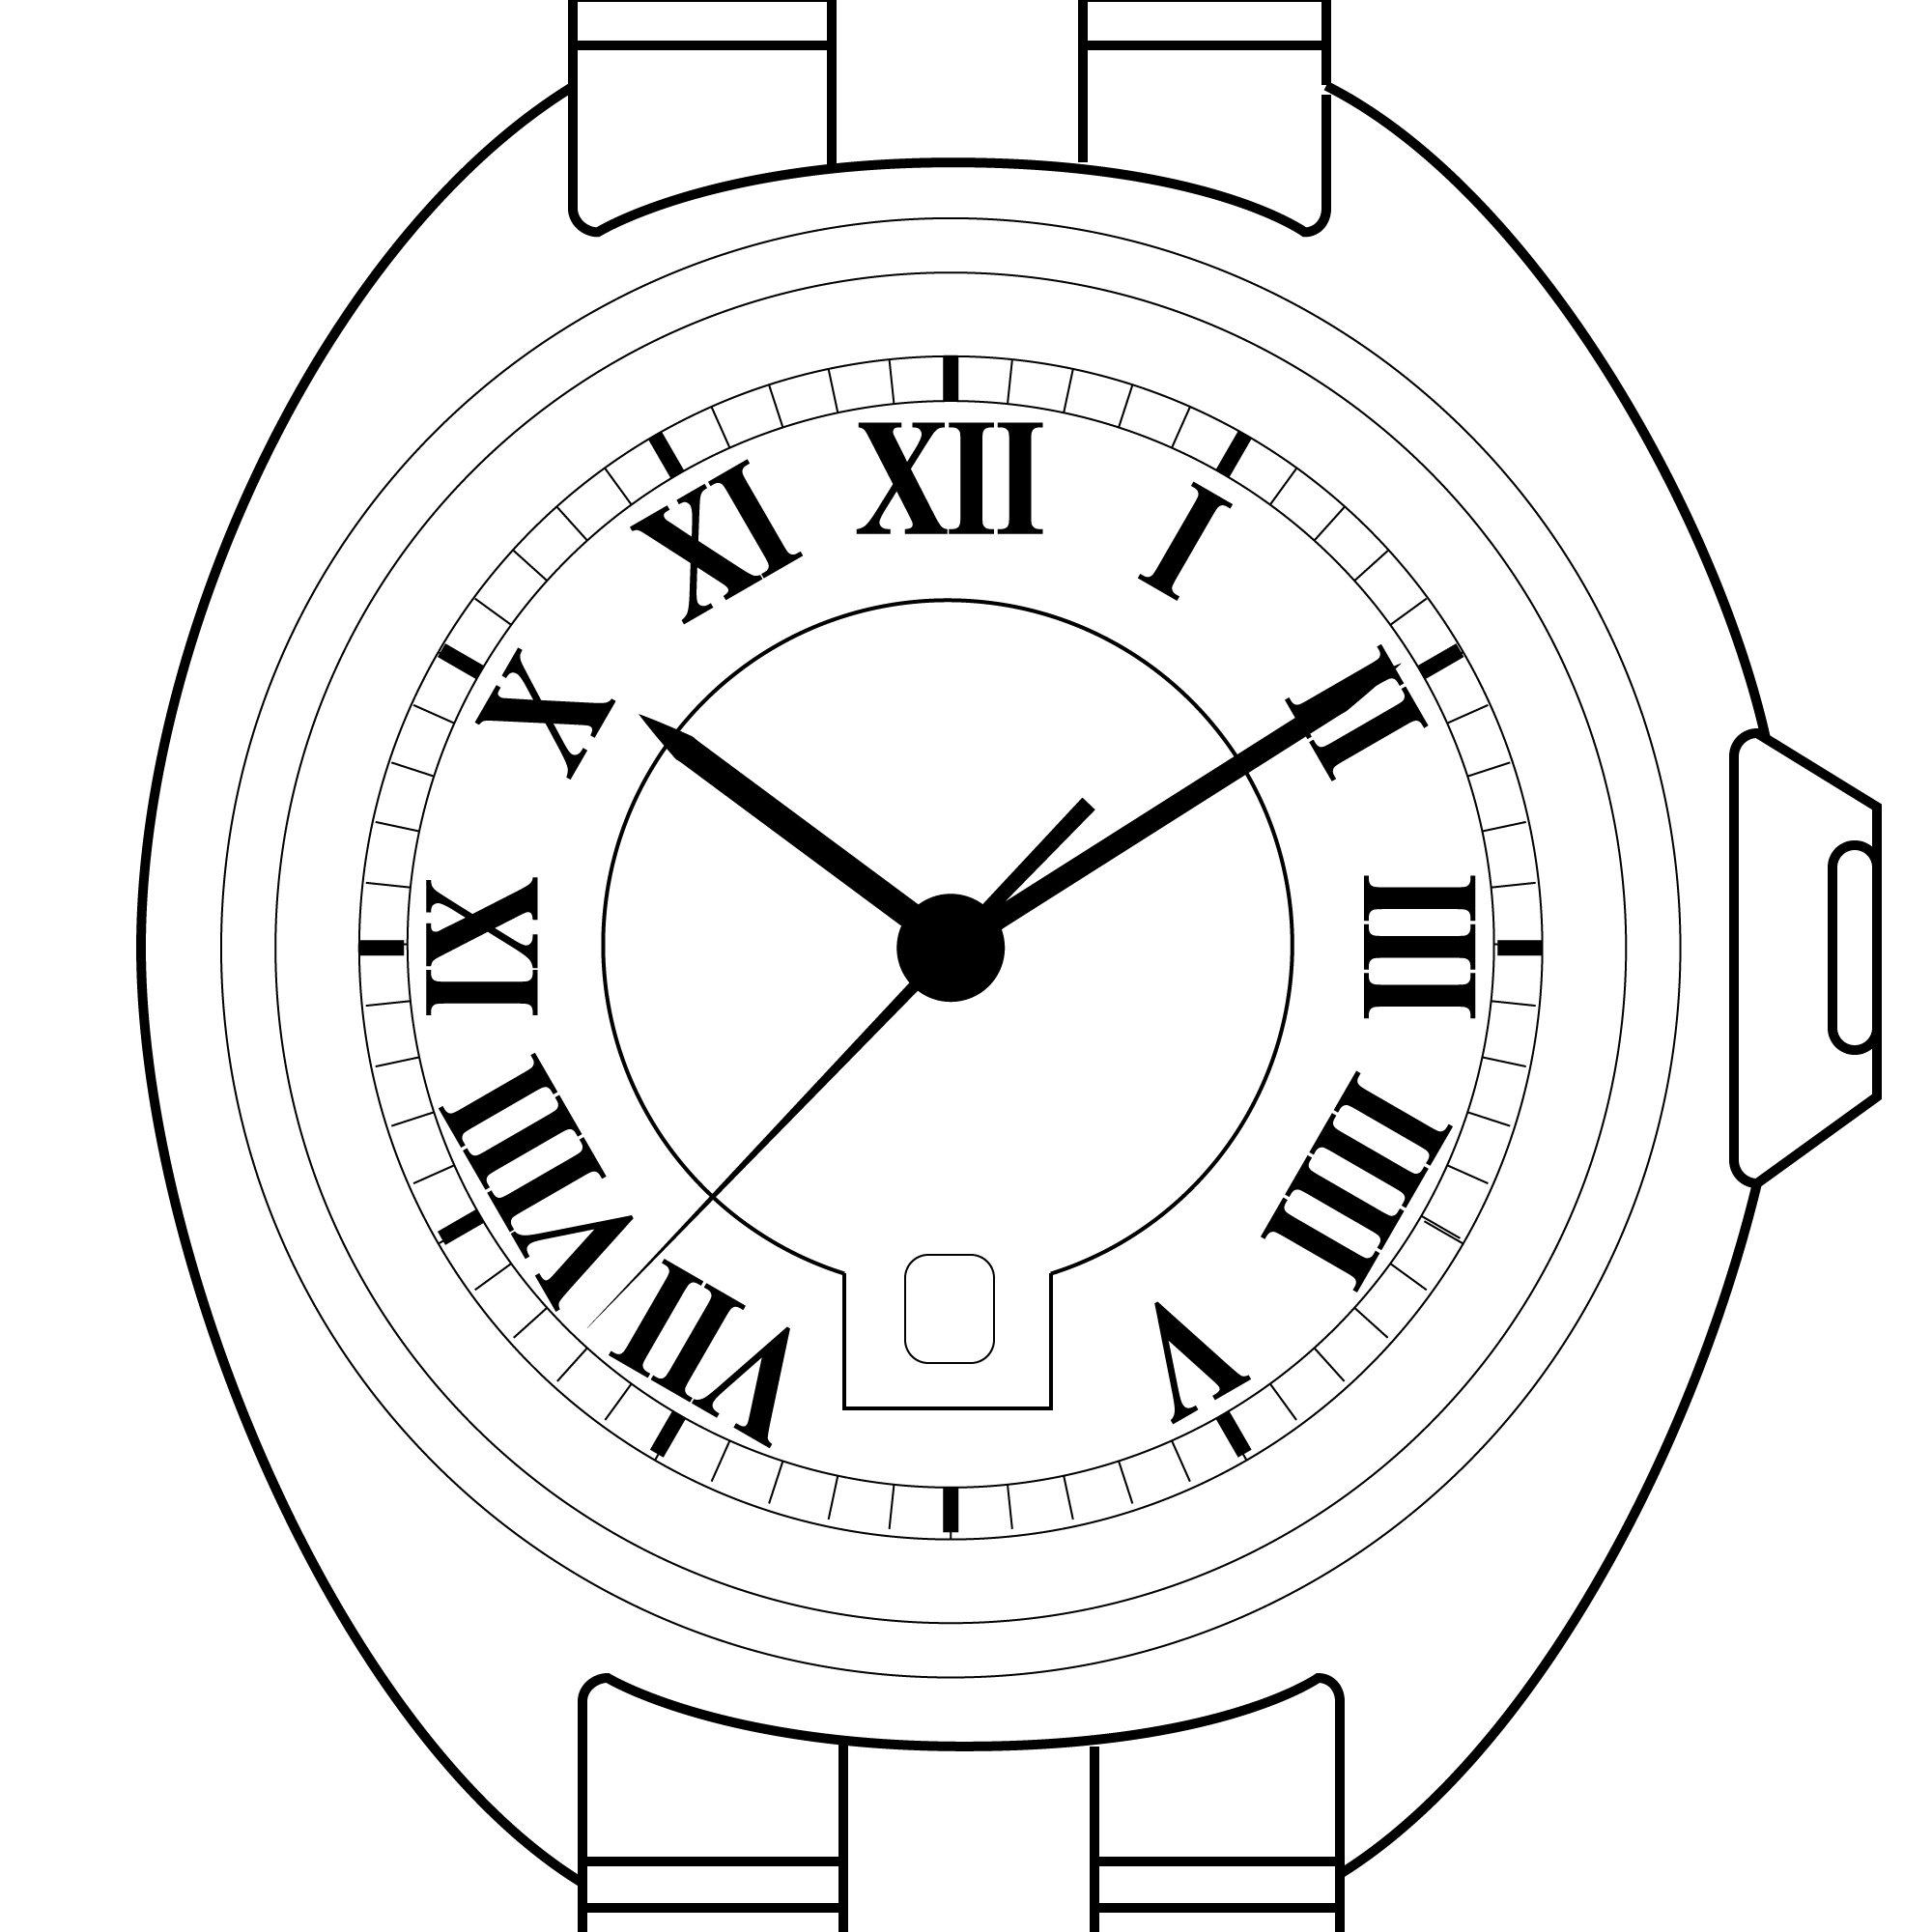 Rolex Watch Drawing